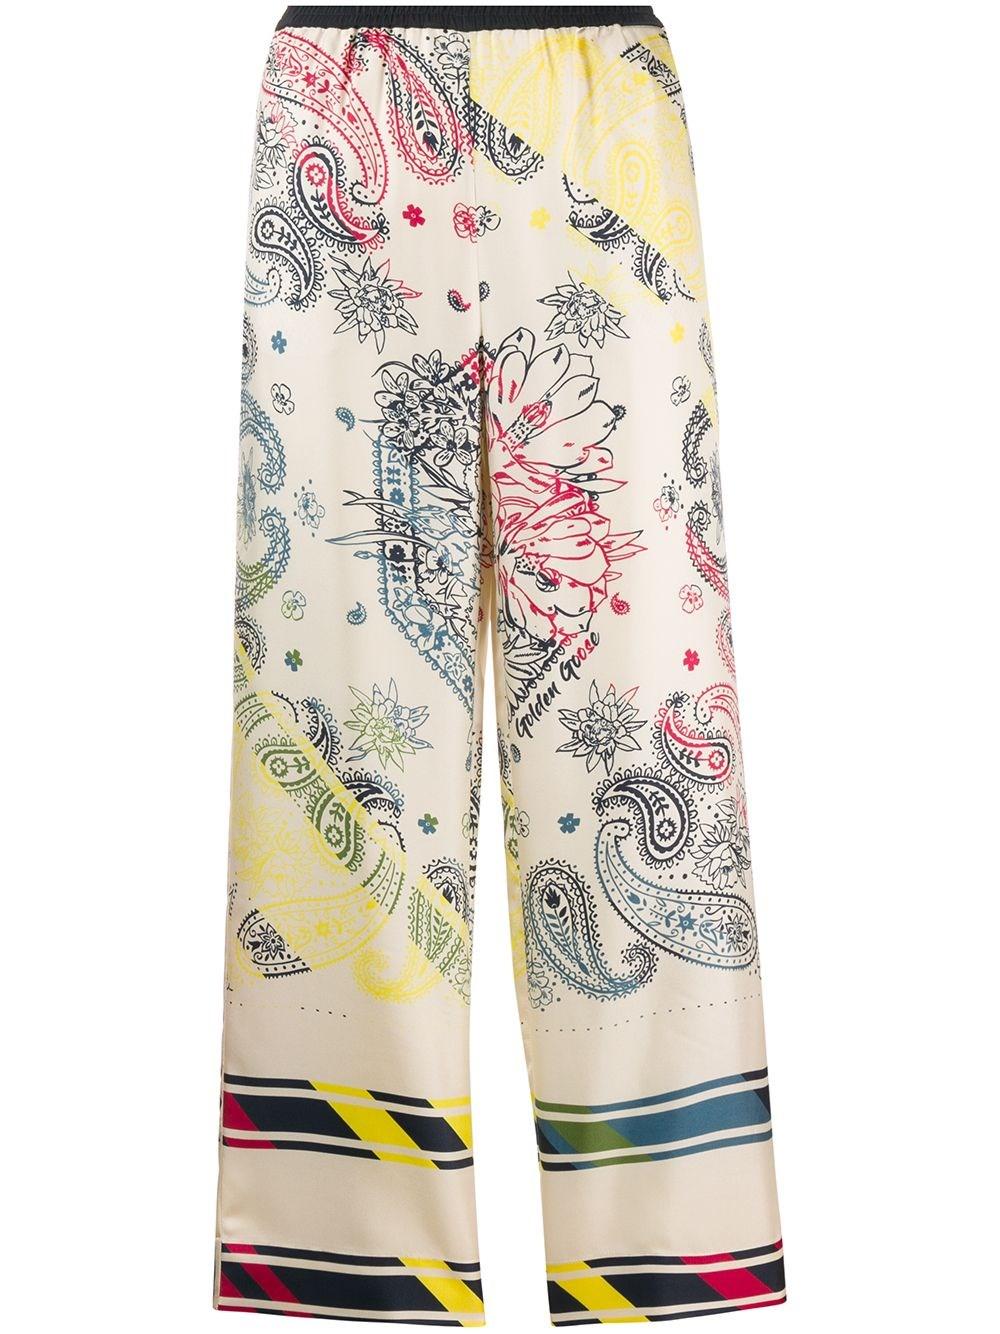 GOLDEN GOOSE DELUXE BRAND Bandana Print Silk Trousers